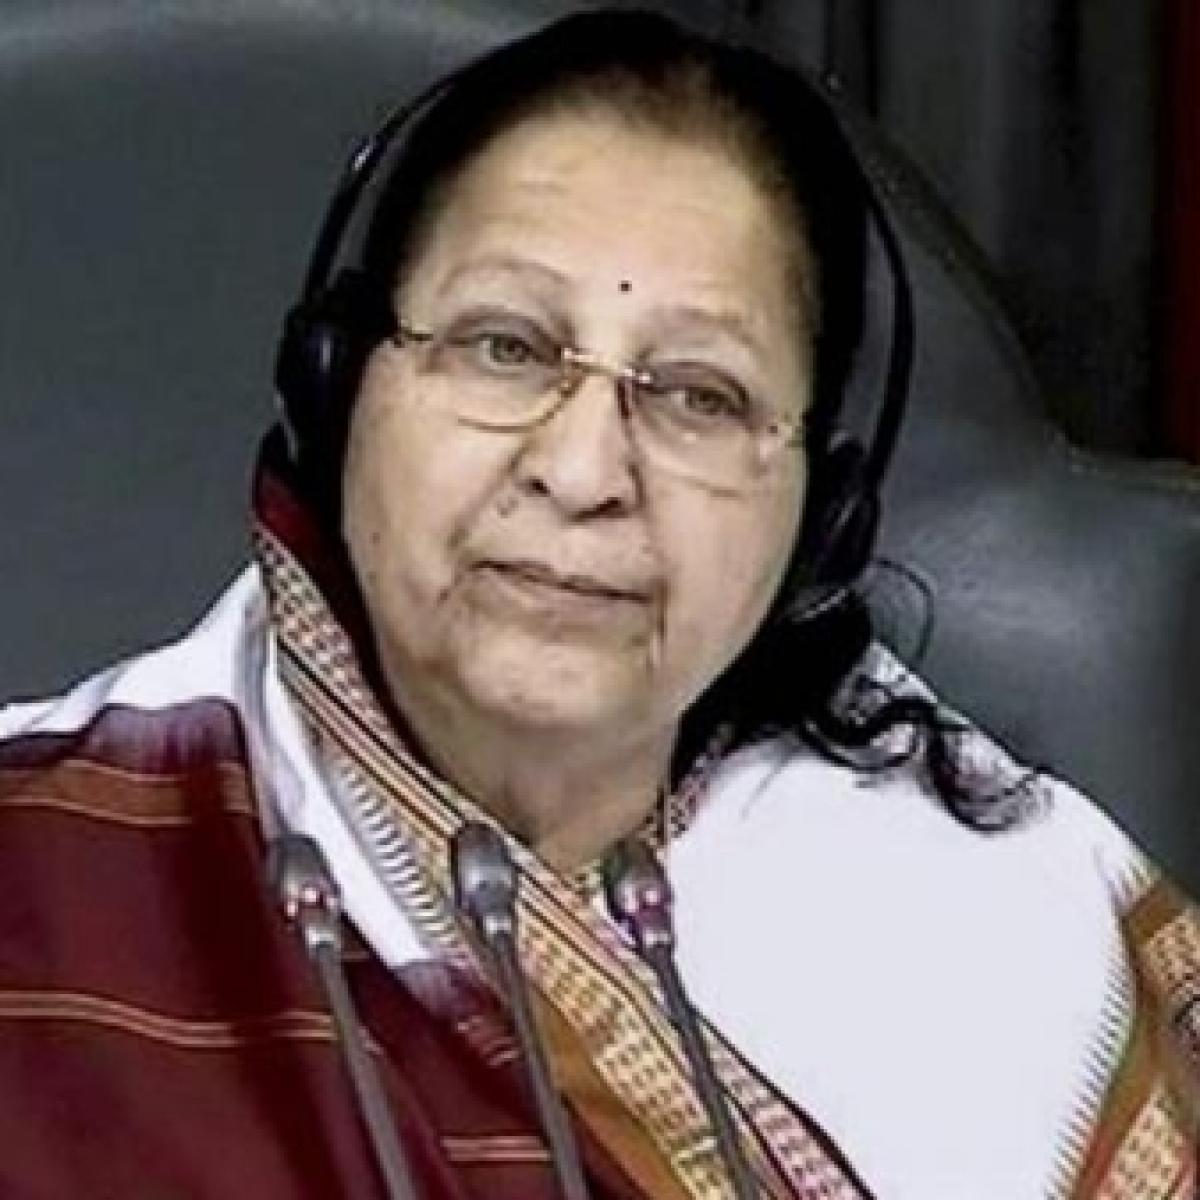 Former Lok Sabha speaker Sumitra Mahajan says it was good to see Muslim women in large number attending protests